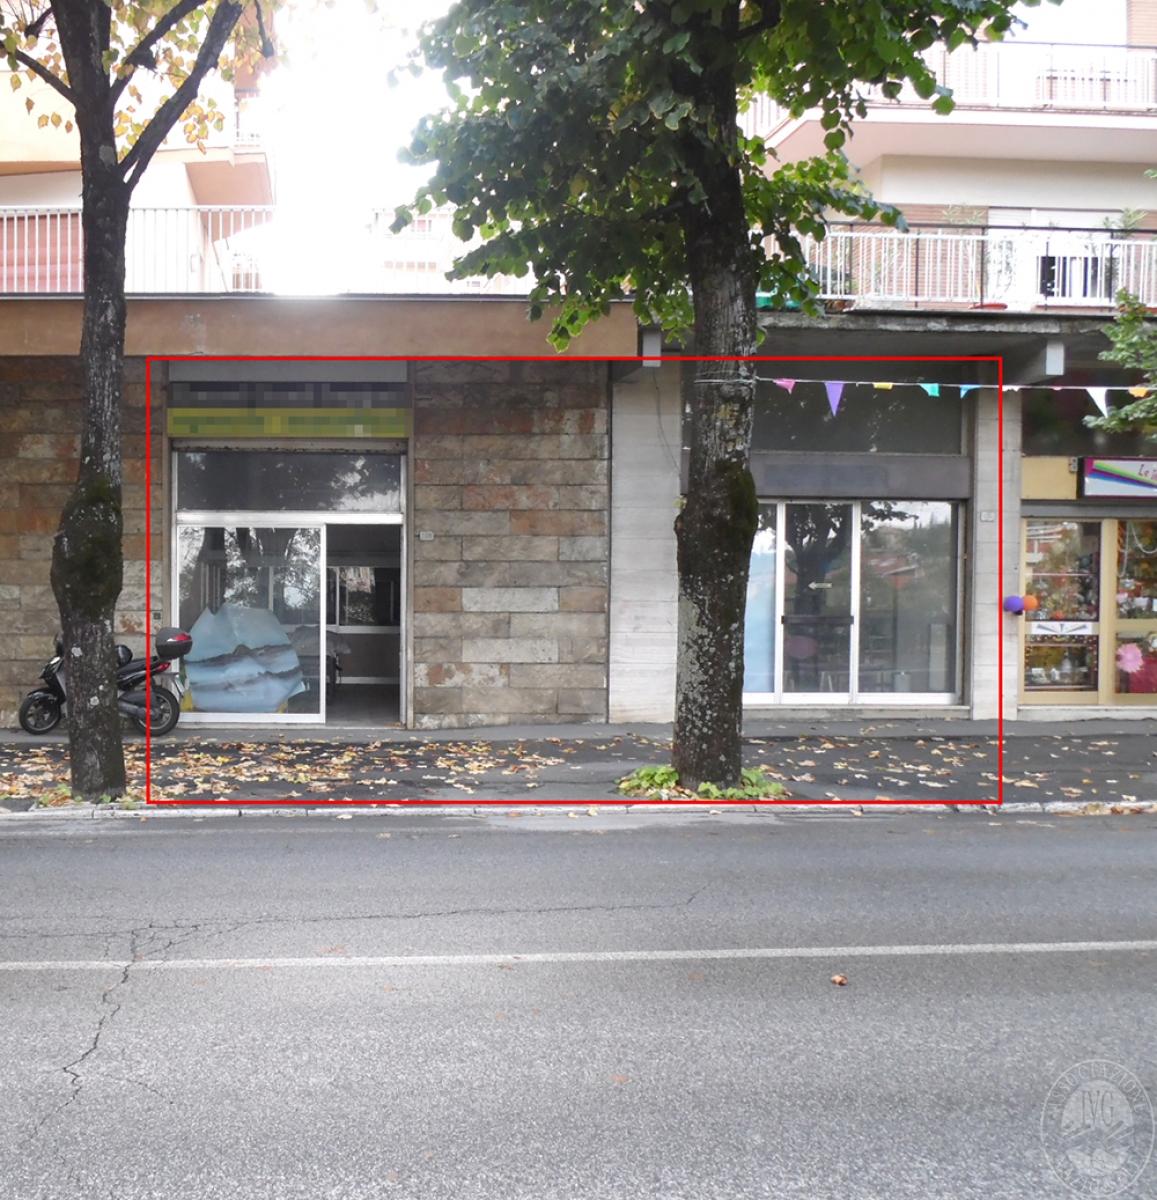 Locale commerciale a CHIANCIANO TERME 3